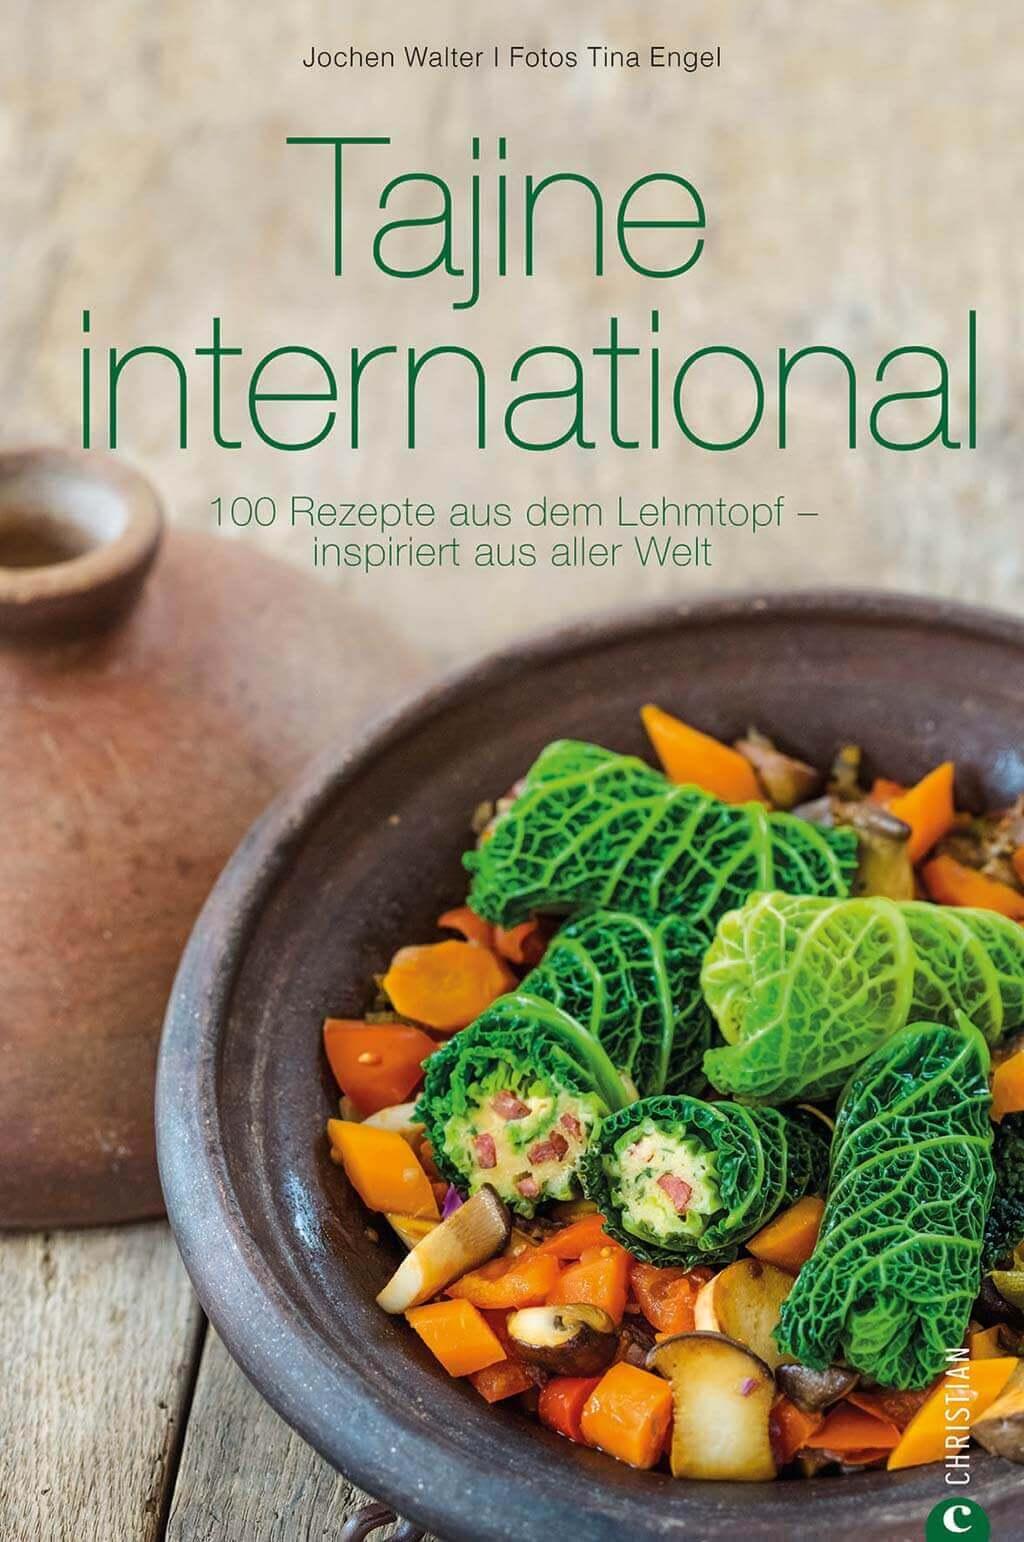 Tajine International